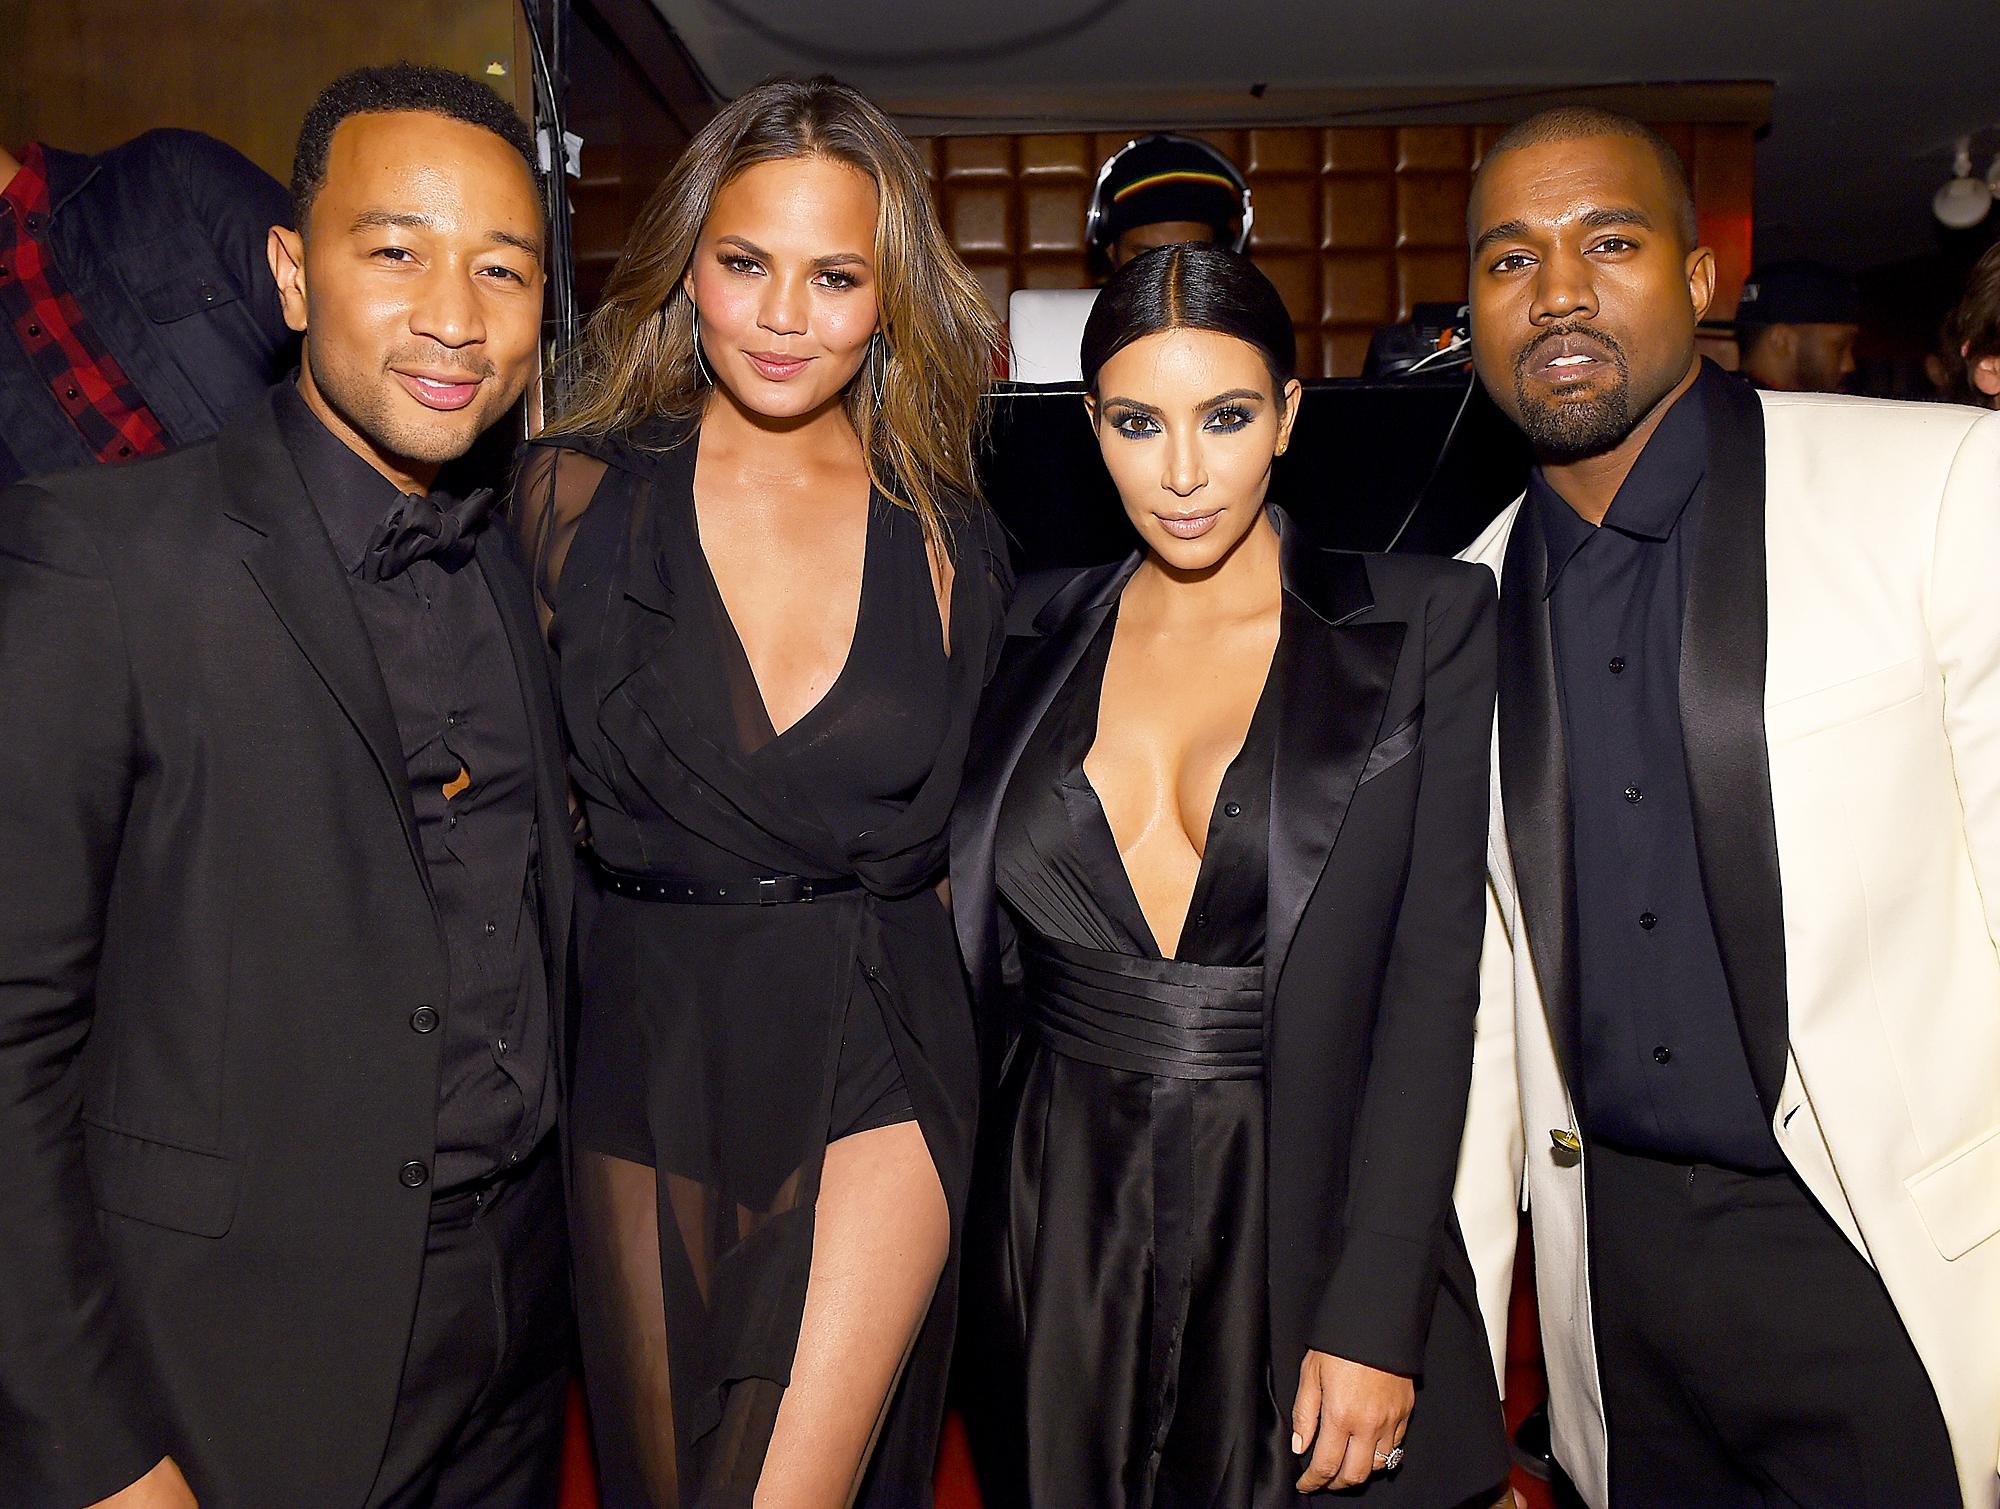 John Legend, Chrissy Teigen, Kim Kardashian and Kanye West